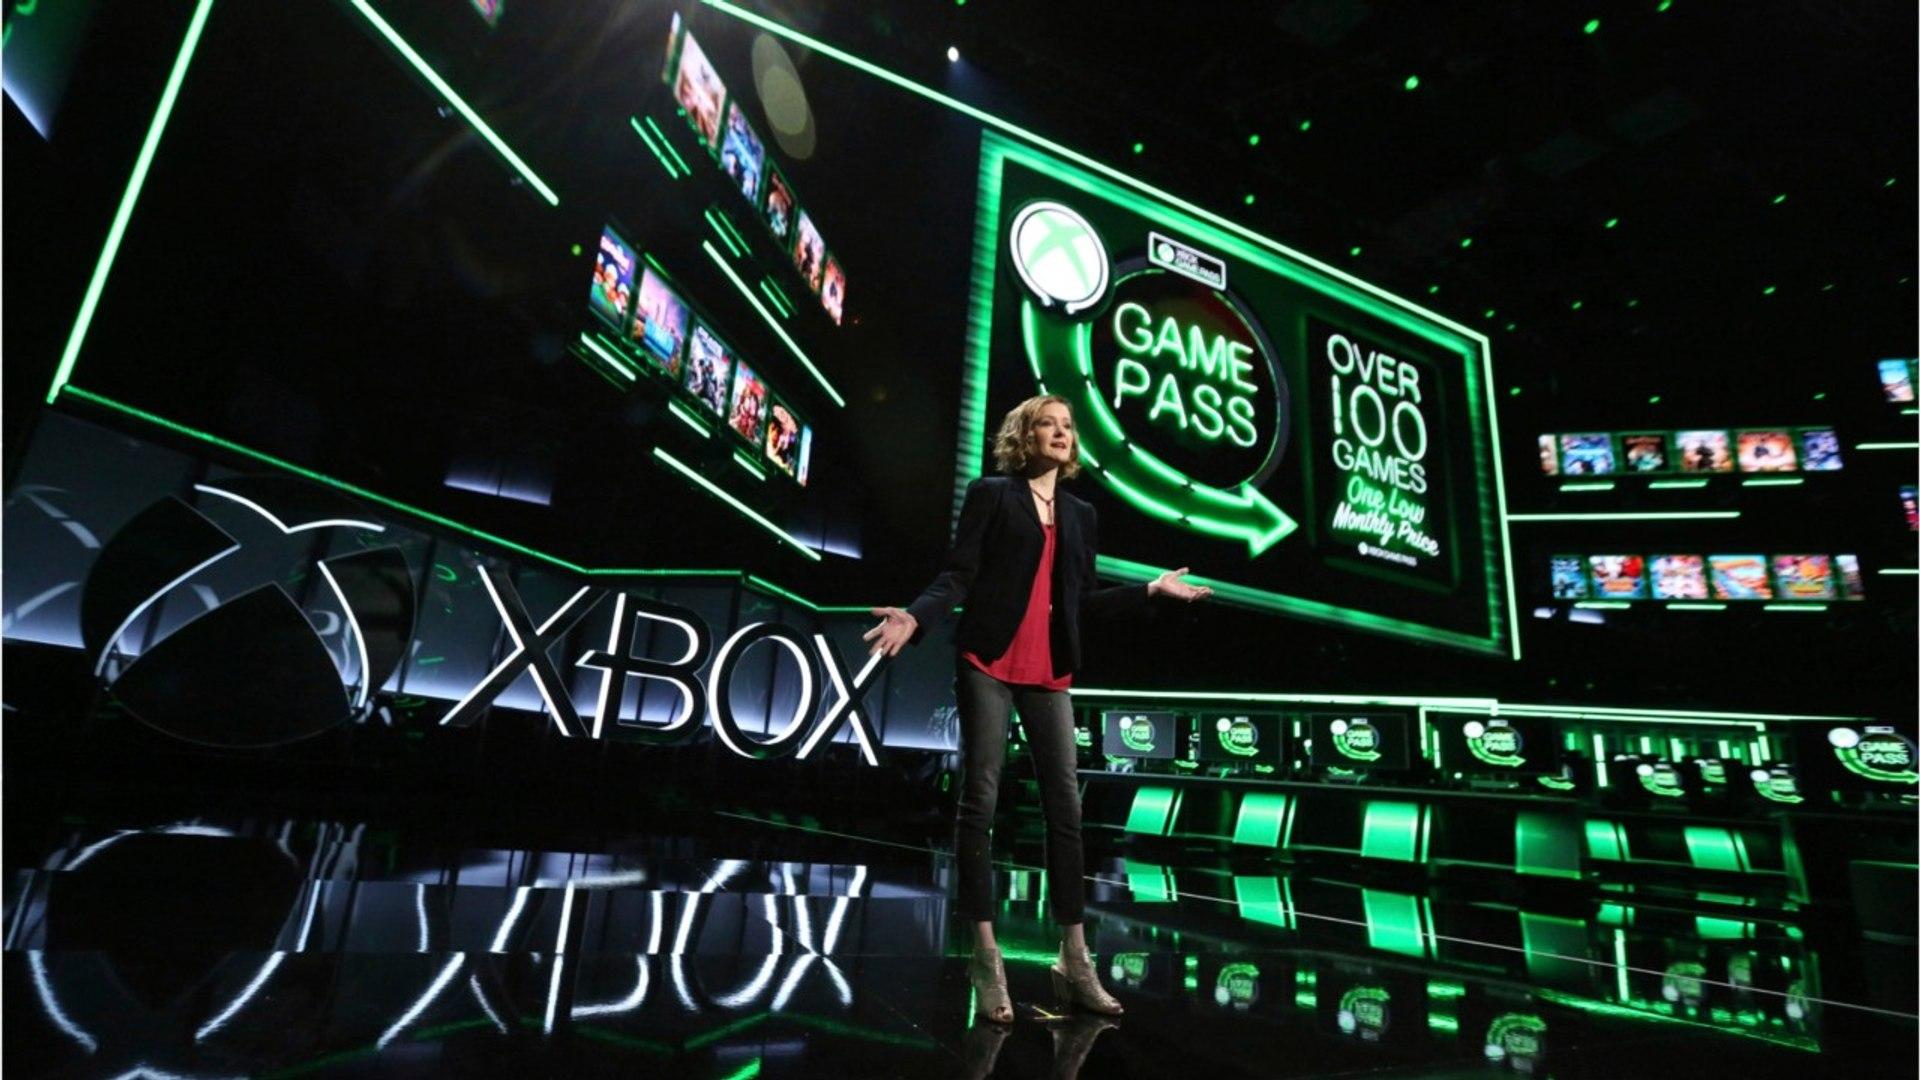 Xbox Scarlett Launching During 2020 Holiday Season